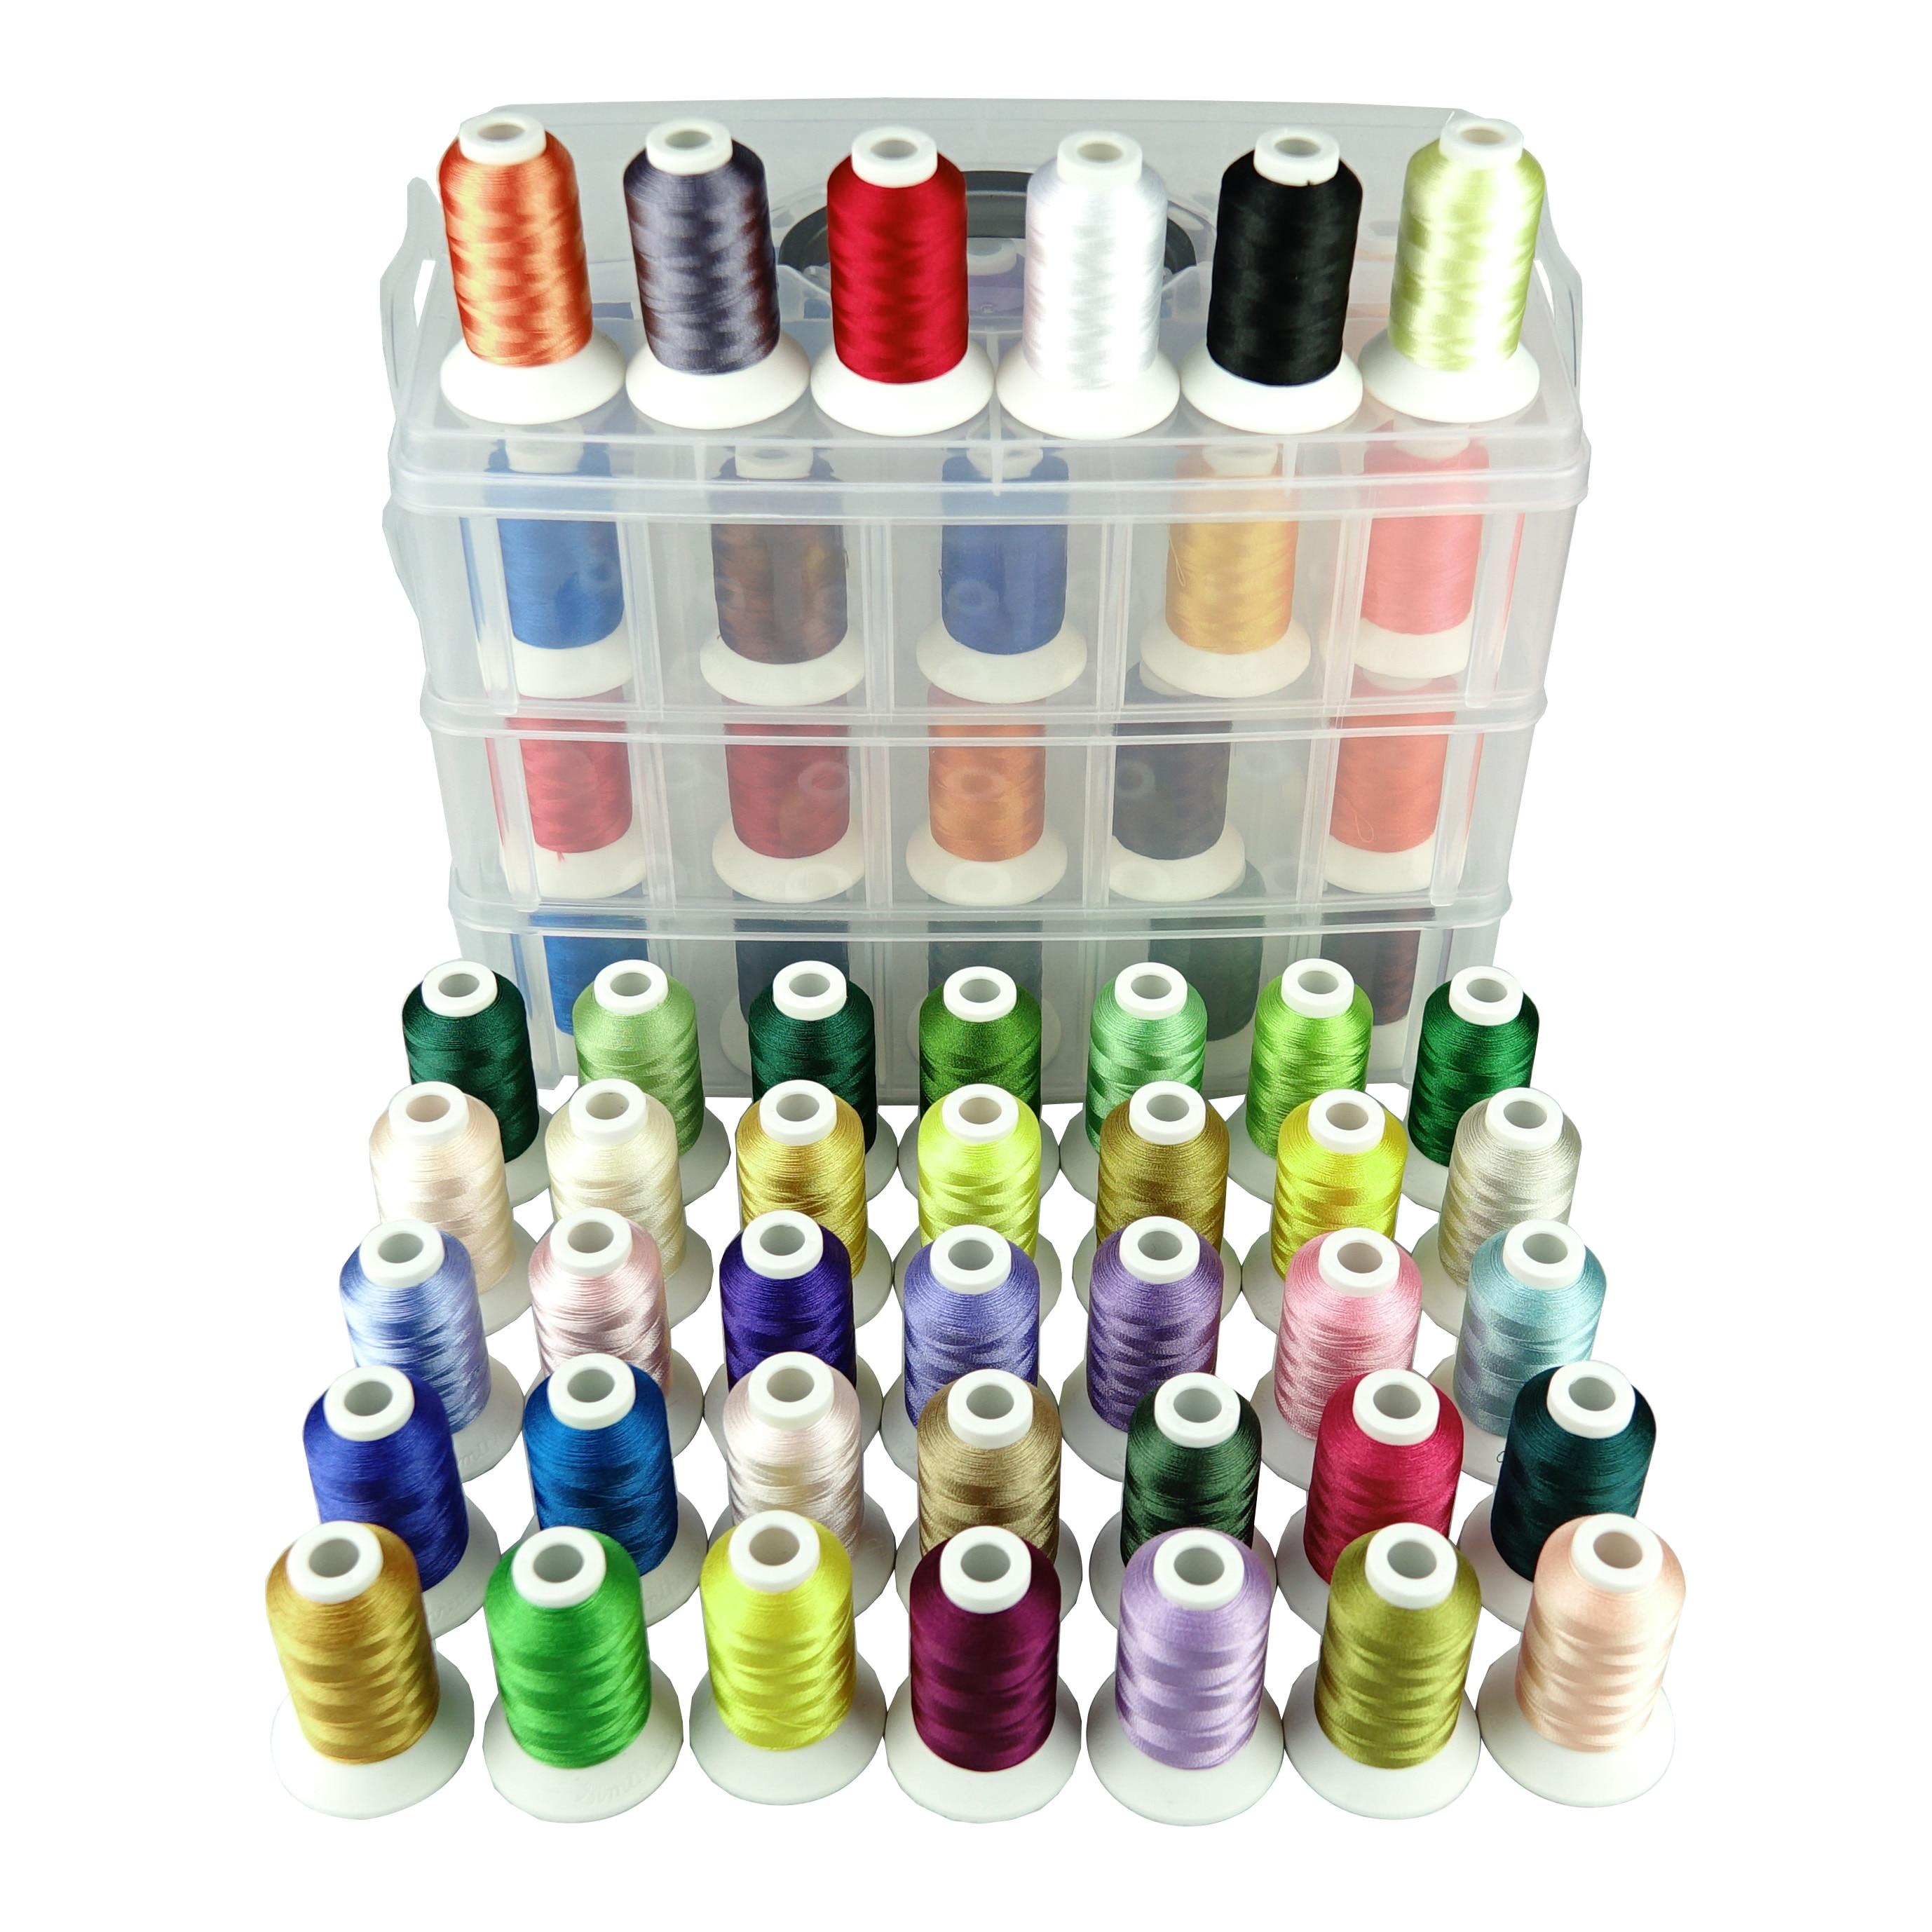 Simخيط تطريز لماكينة البوليستر 40/63/80 ألوان براذر مع صندوق تخزين بلاستيكي